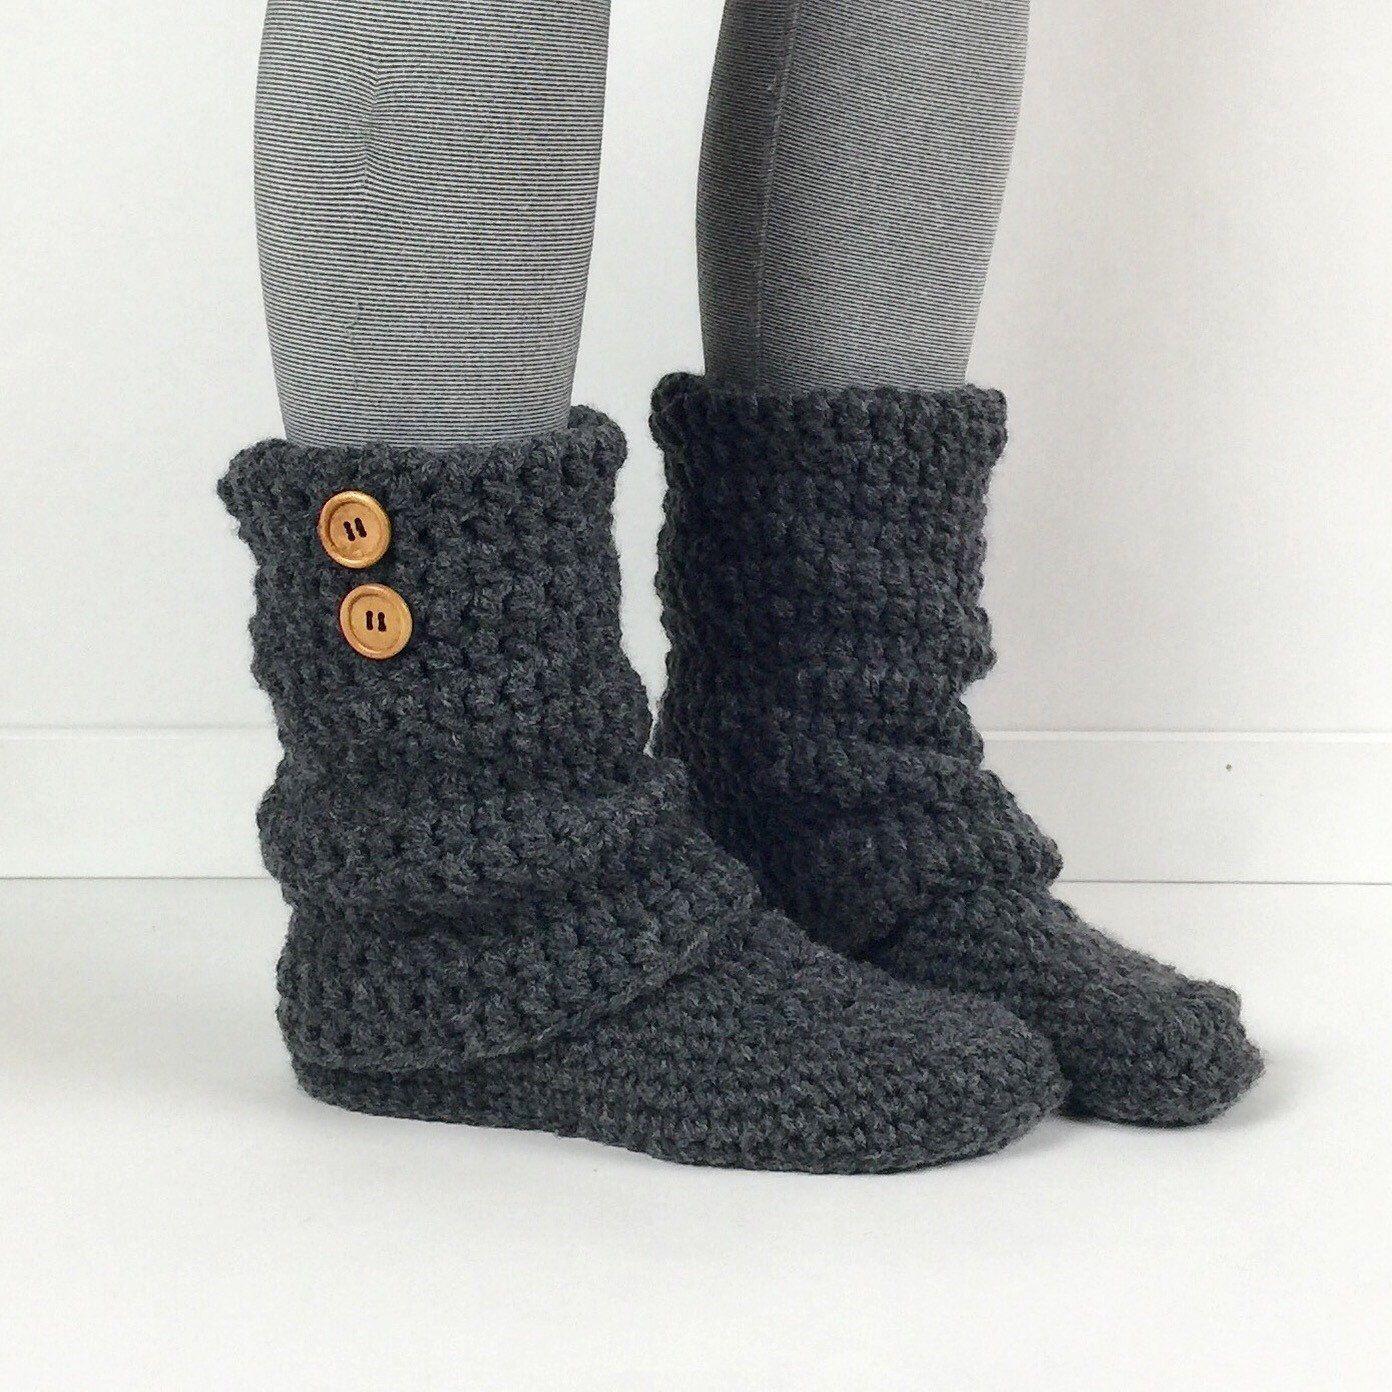 Women's Crochet Dark Gray Slouchy Slipper Boots, Crochet Slippers, Crochet Booties, Crochet Leg Warmer Boot, Knitted Grey Slipper Boots by StardustStyle on Etsy https://www.etsy.com/listing/215866803/womens-crochet-dark-gray-slouchy-slipper